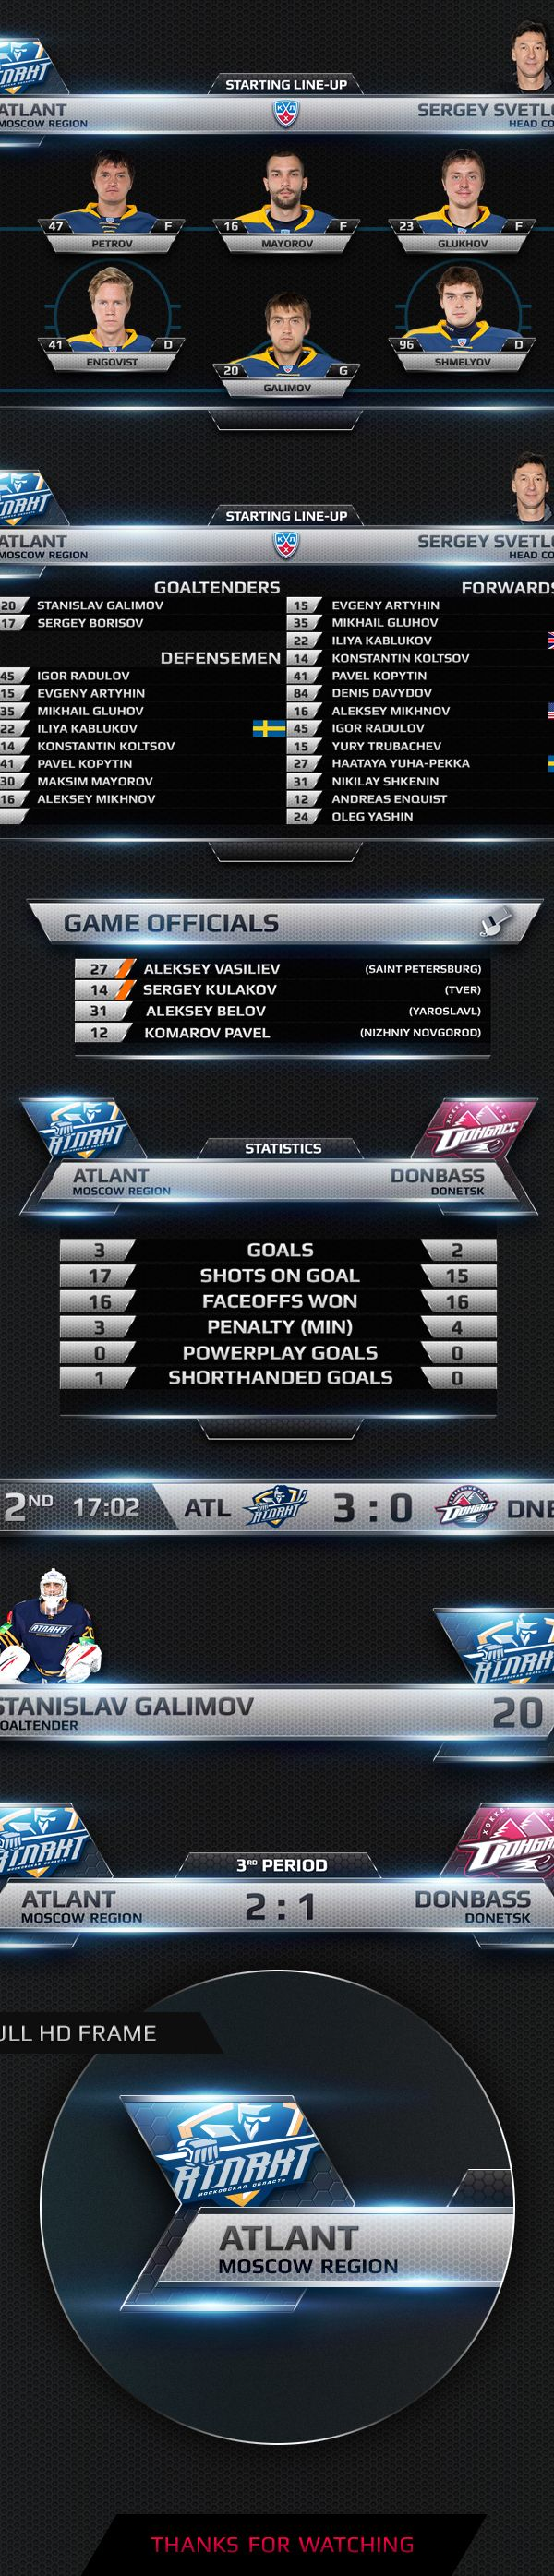 KHL Broadcast Graphics 2013-2014 on Behance